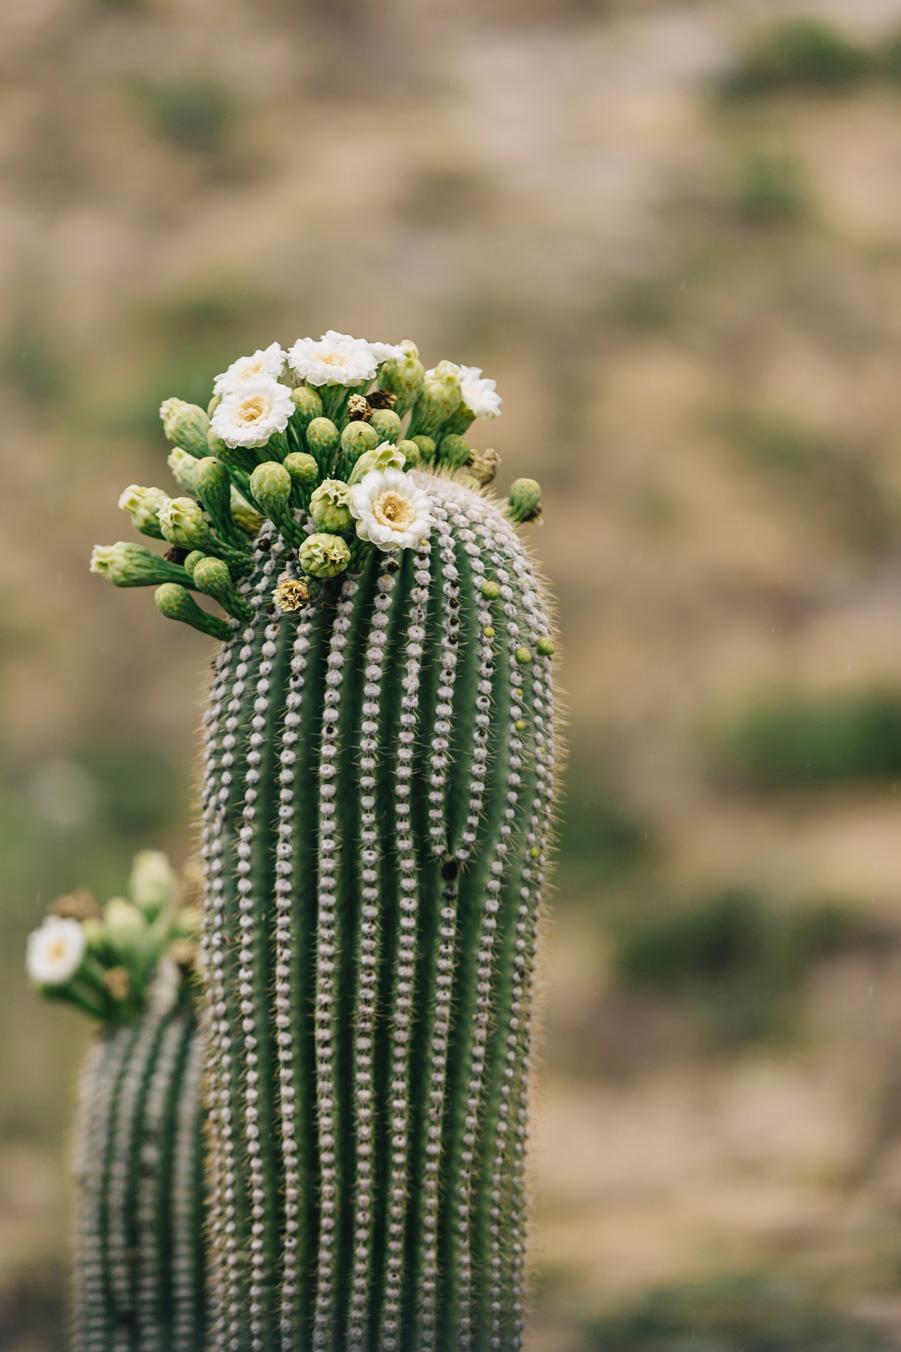 CindyGiovagnoli_Tucson_Arizona_tourism_visit_travel_guide_Sonoran_desert-007.jpg